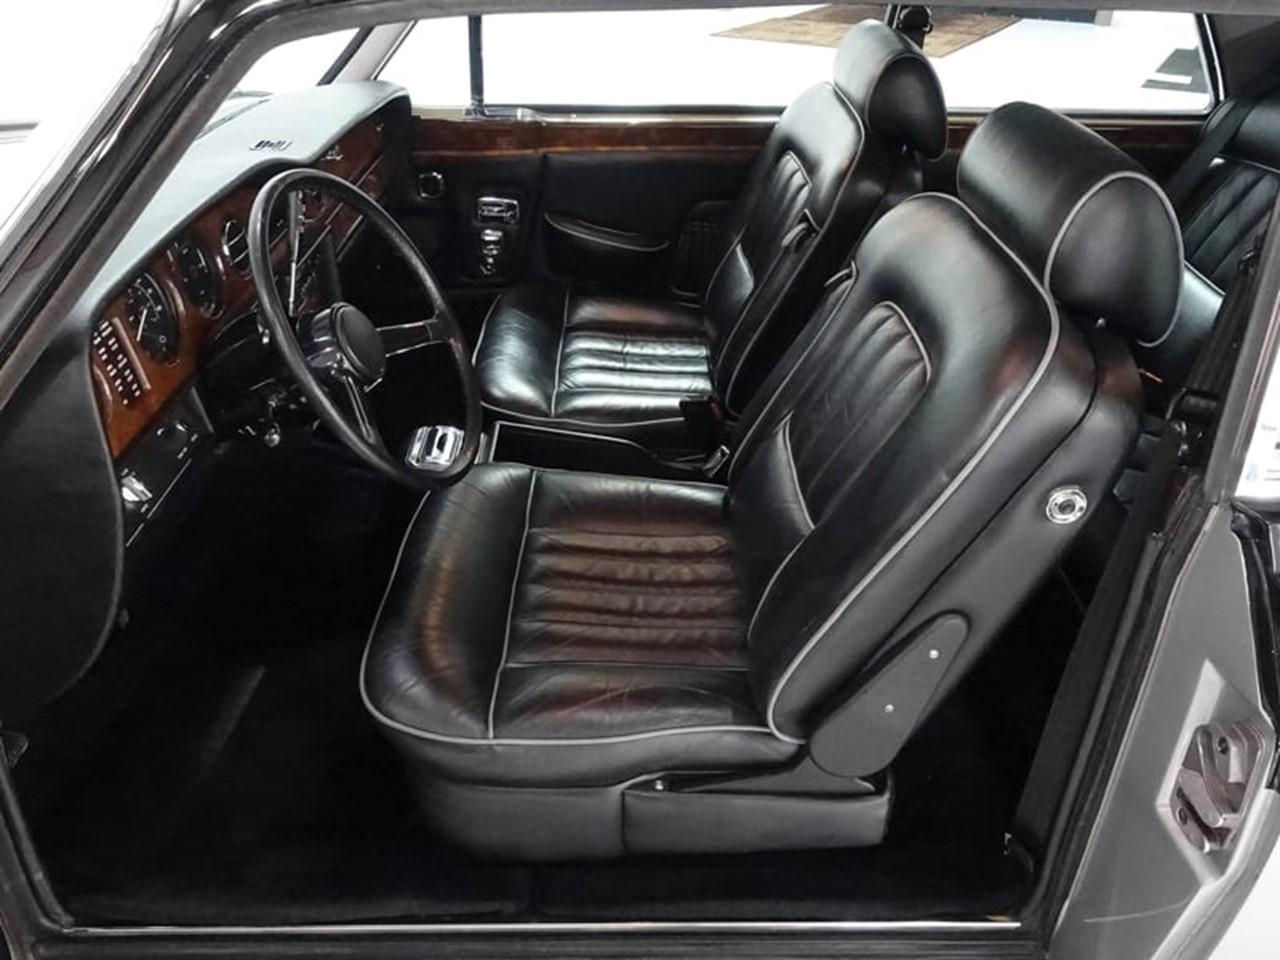 Corniche Coachbuilt coupe 13